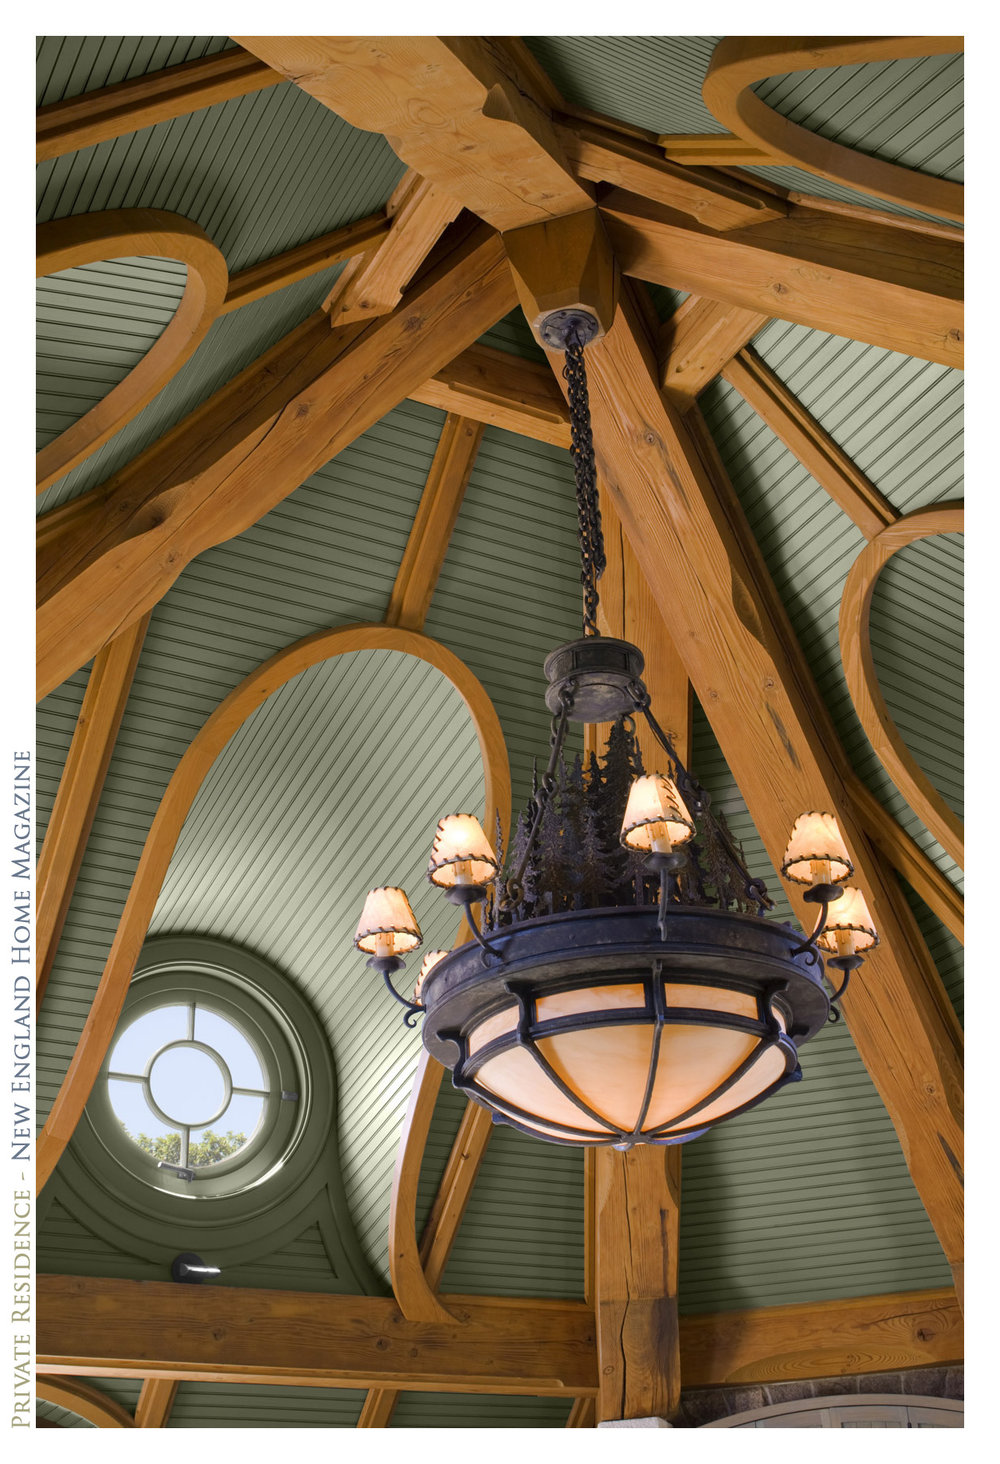 039_Robert-Benson-Photography-Residence-New-England-Home-Magazine-Ceiling-24.JPG